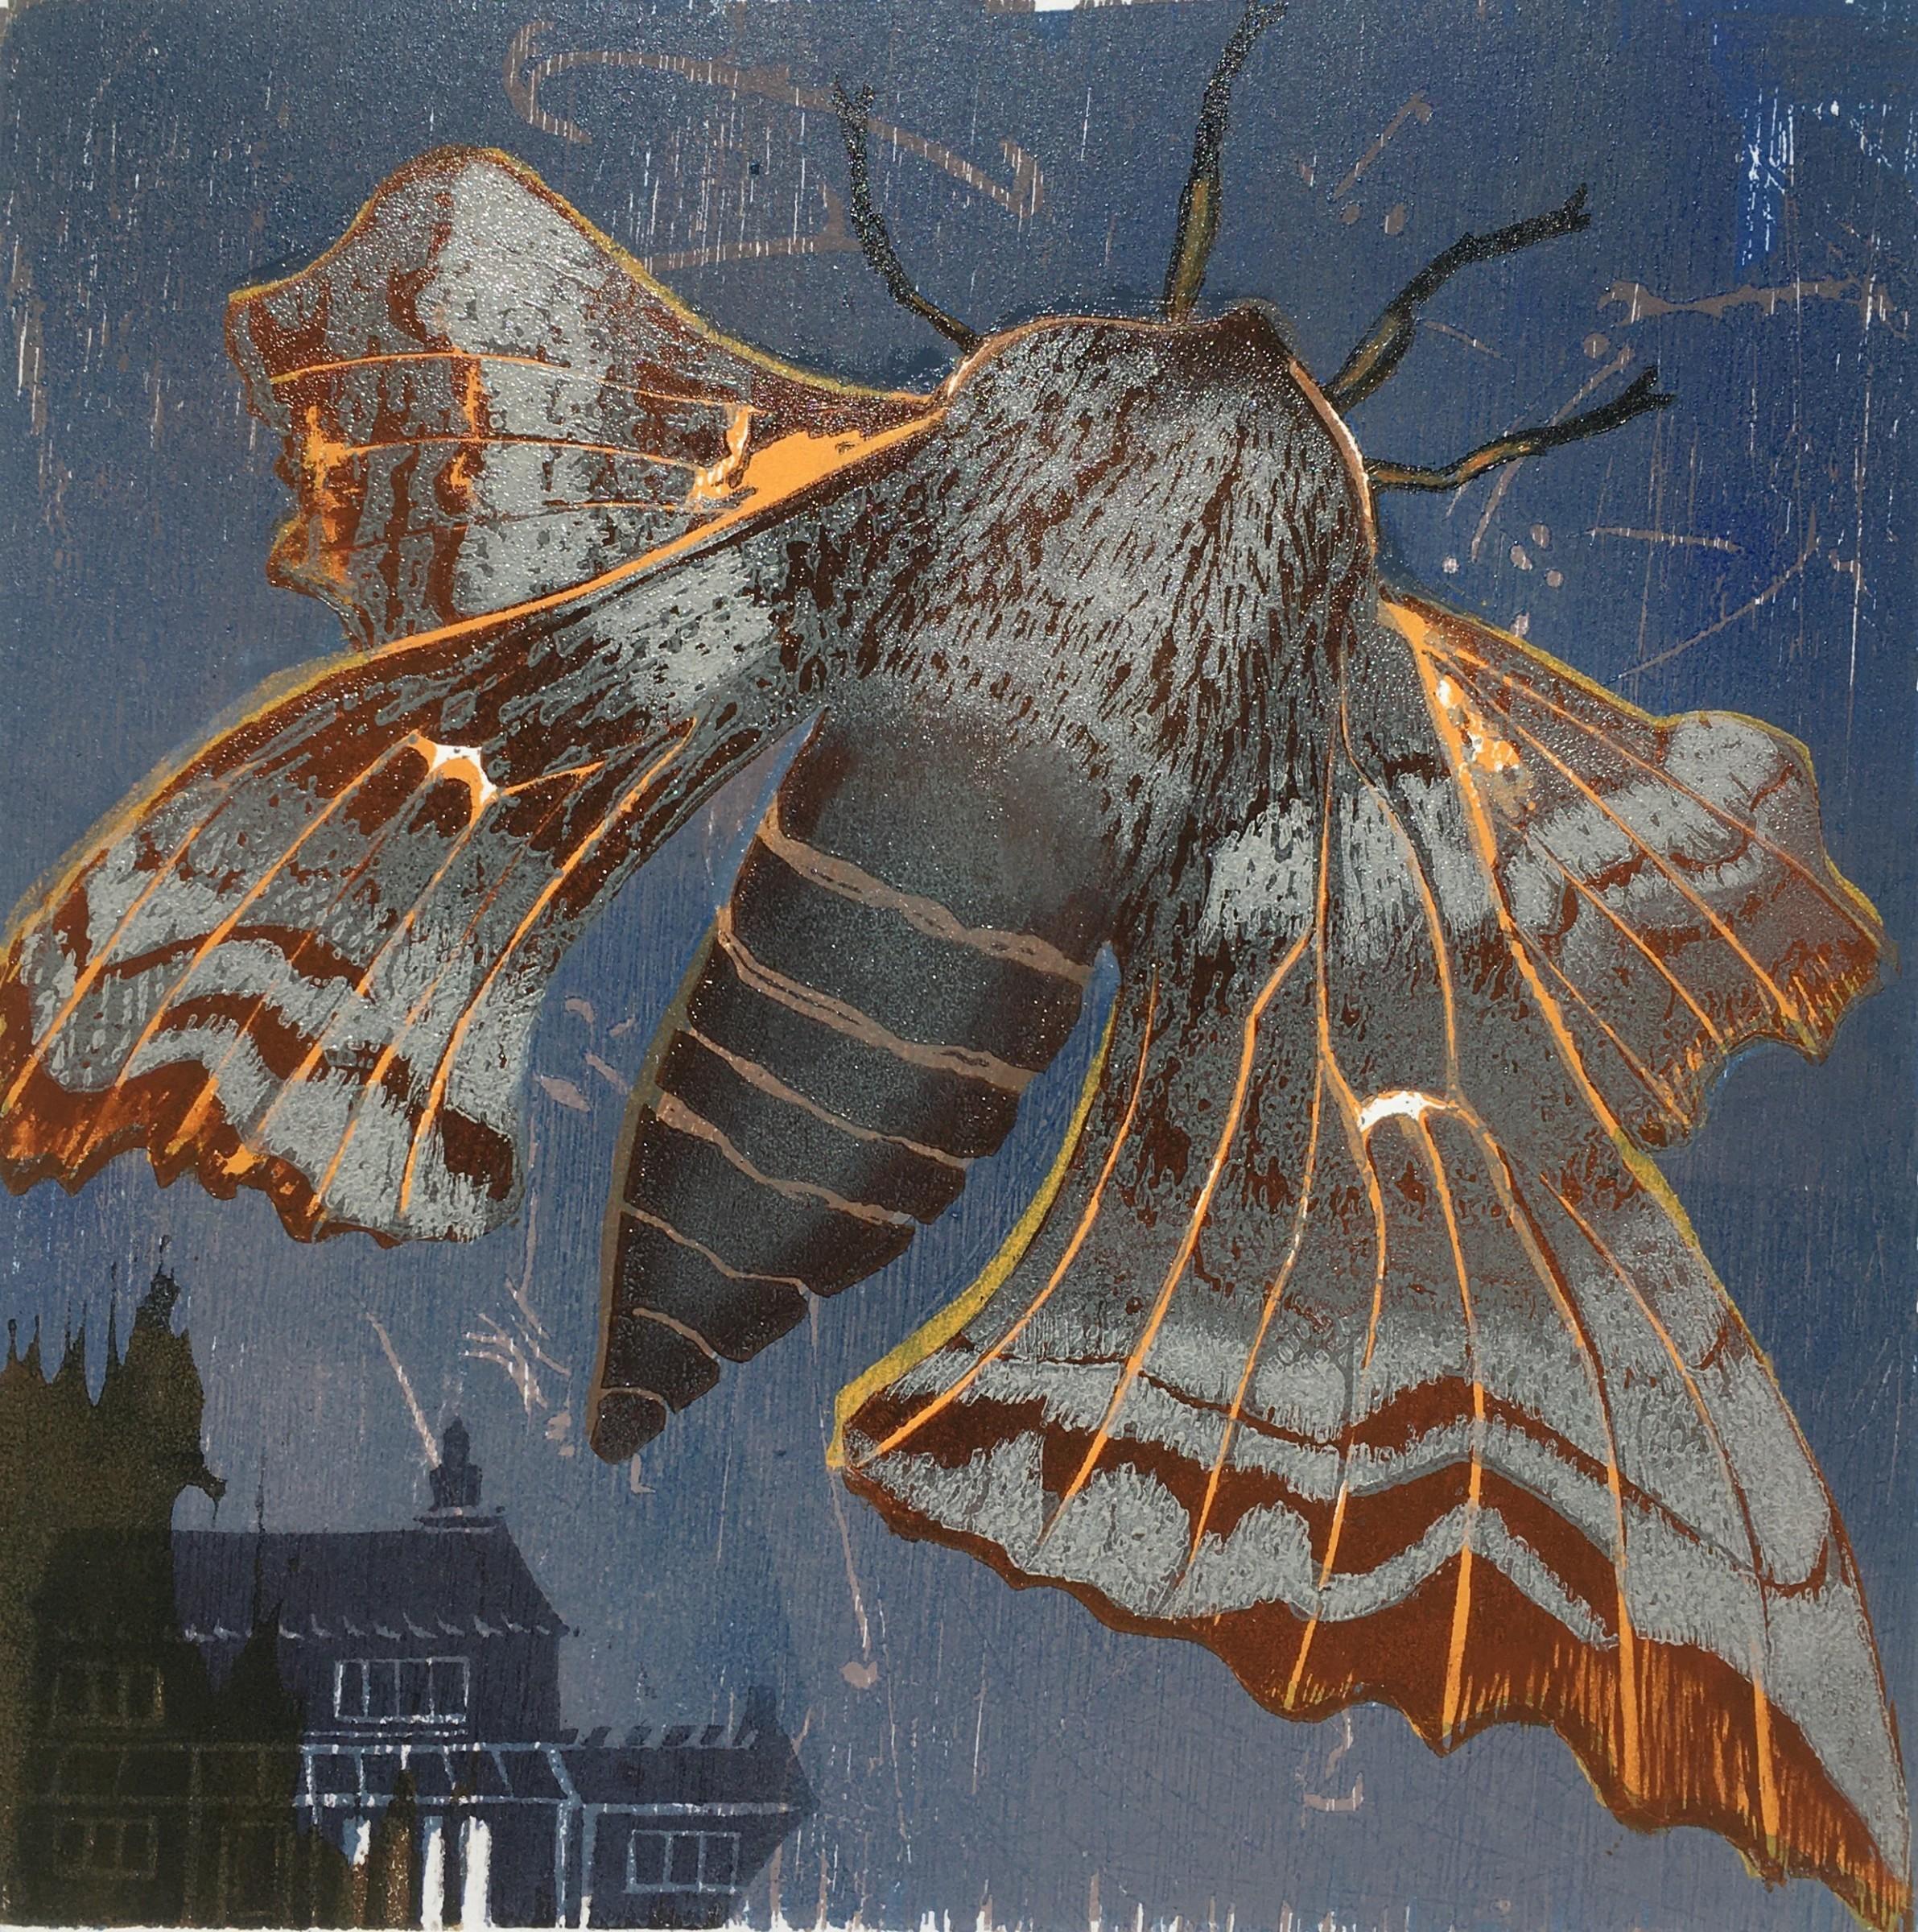 "<span class=""link fancybox-details-link""><a href=""/exhibitions/23/works/artworks_standalone10918/"">View Detail Page</a></span><div class=""artist""><span class=""artist""><strong>Julia Manning RE</strong></span></div><div class=""title""><em>My Garden Moths, Poplar Hawkmoth</em></div><div class=""medium"">wood cut</div><div class=""dimensions"">45 x 45 cm paper size<br>30 x 30 cm image size</div><div class=""edition_details"">edition of 12</div>"